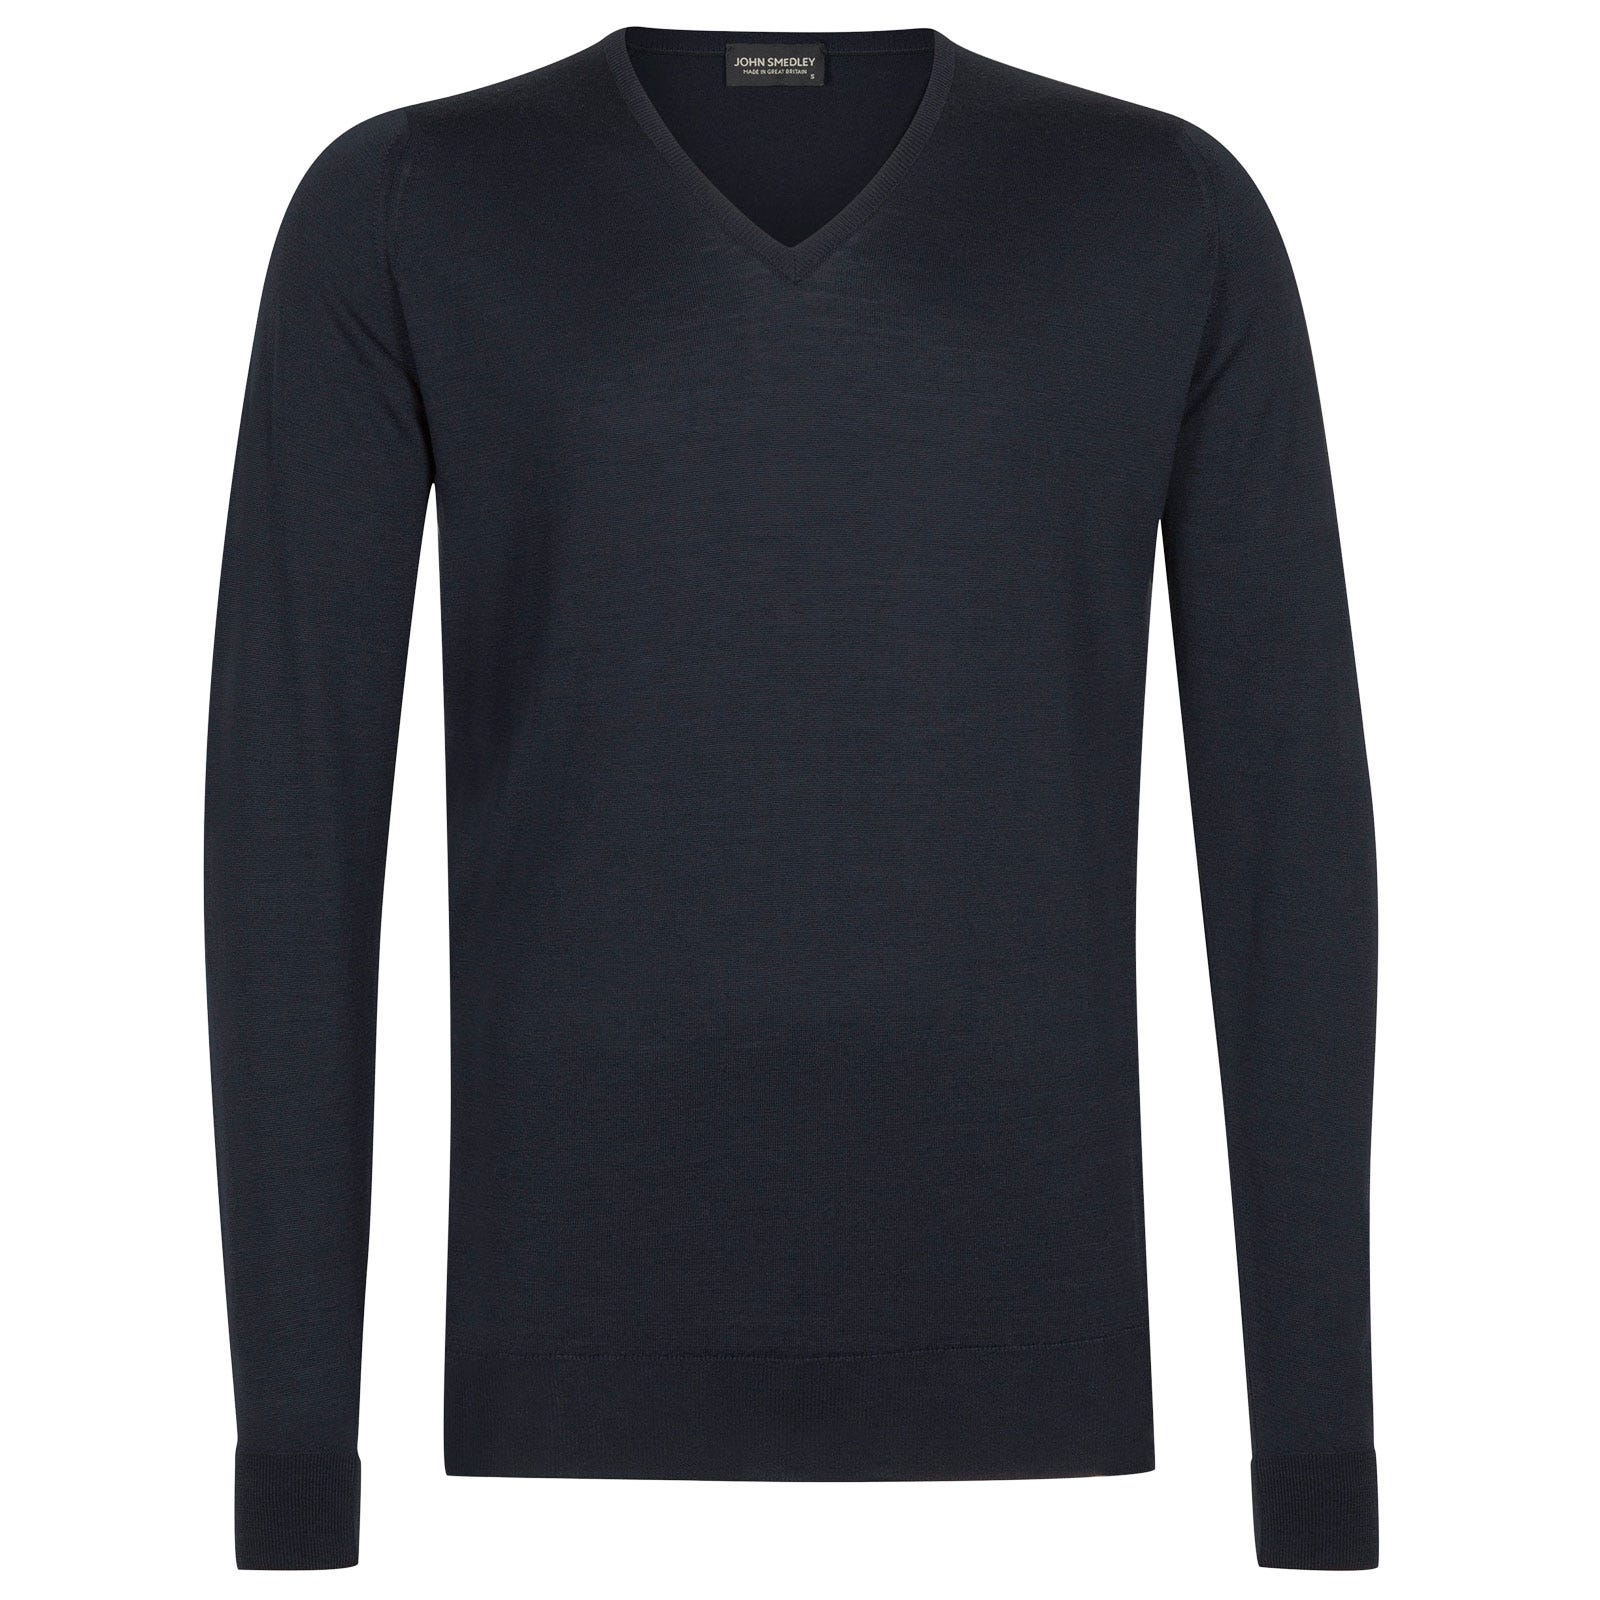 John Smedley bobby Merino Wool Pullover in Midnight-xs